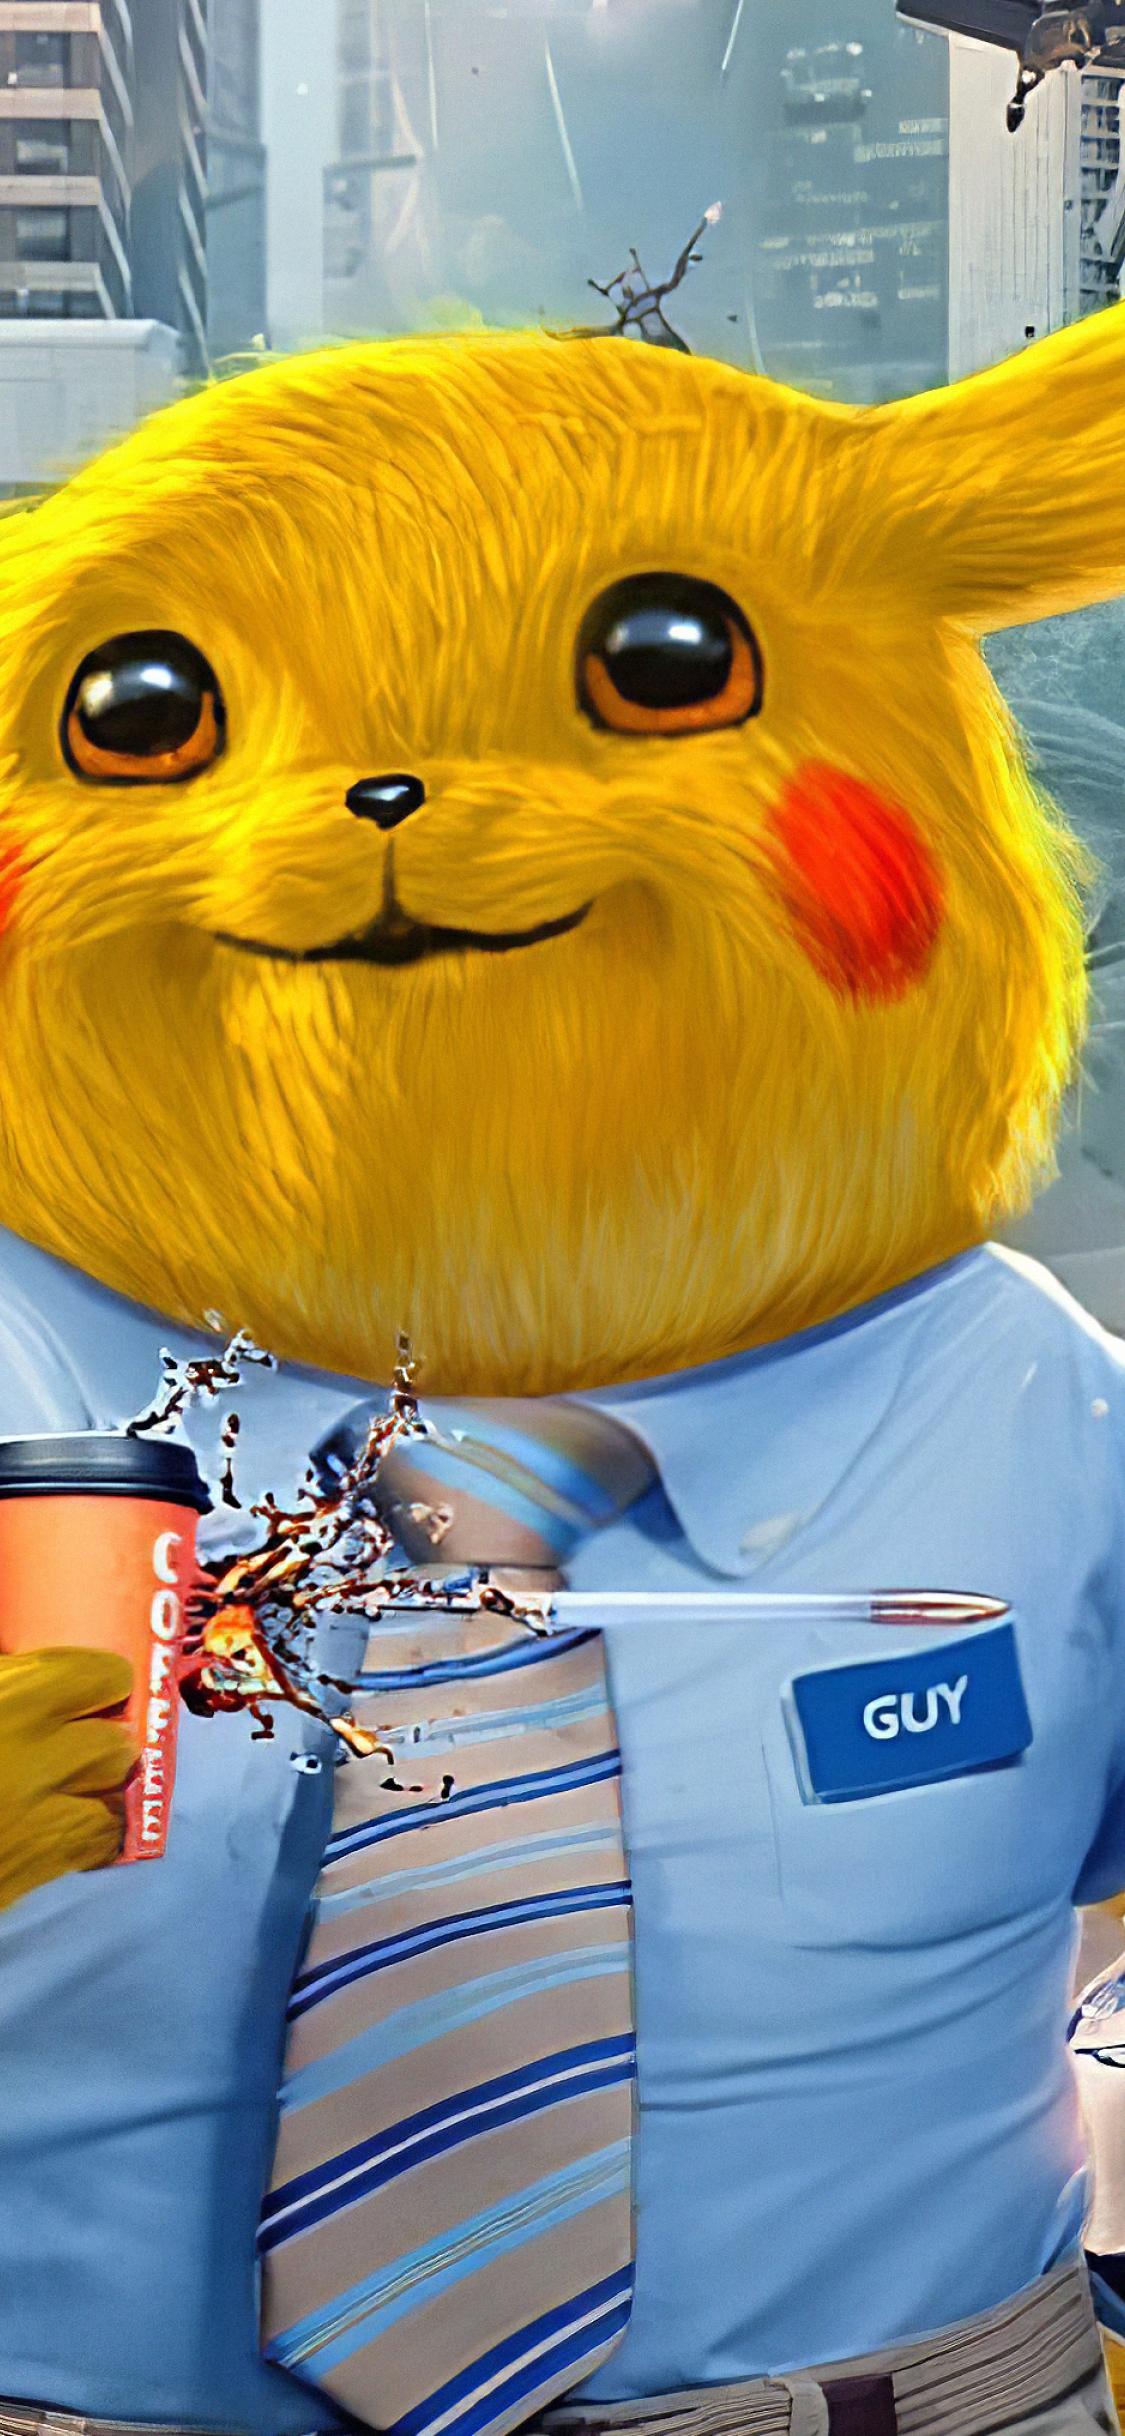 1125x2436 Pikachu as Free Guy Art 4K Iphone XS,Iphone 10 ...